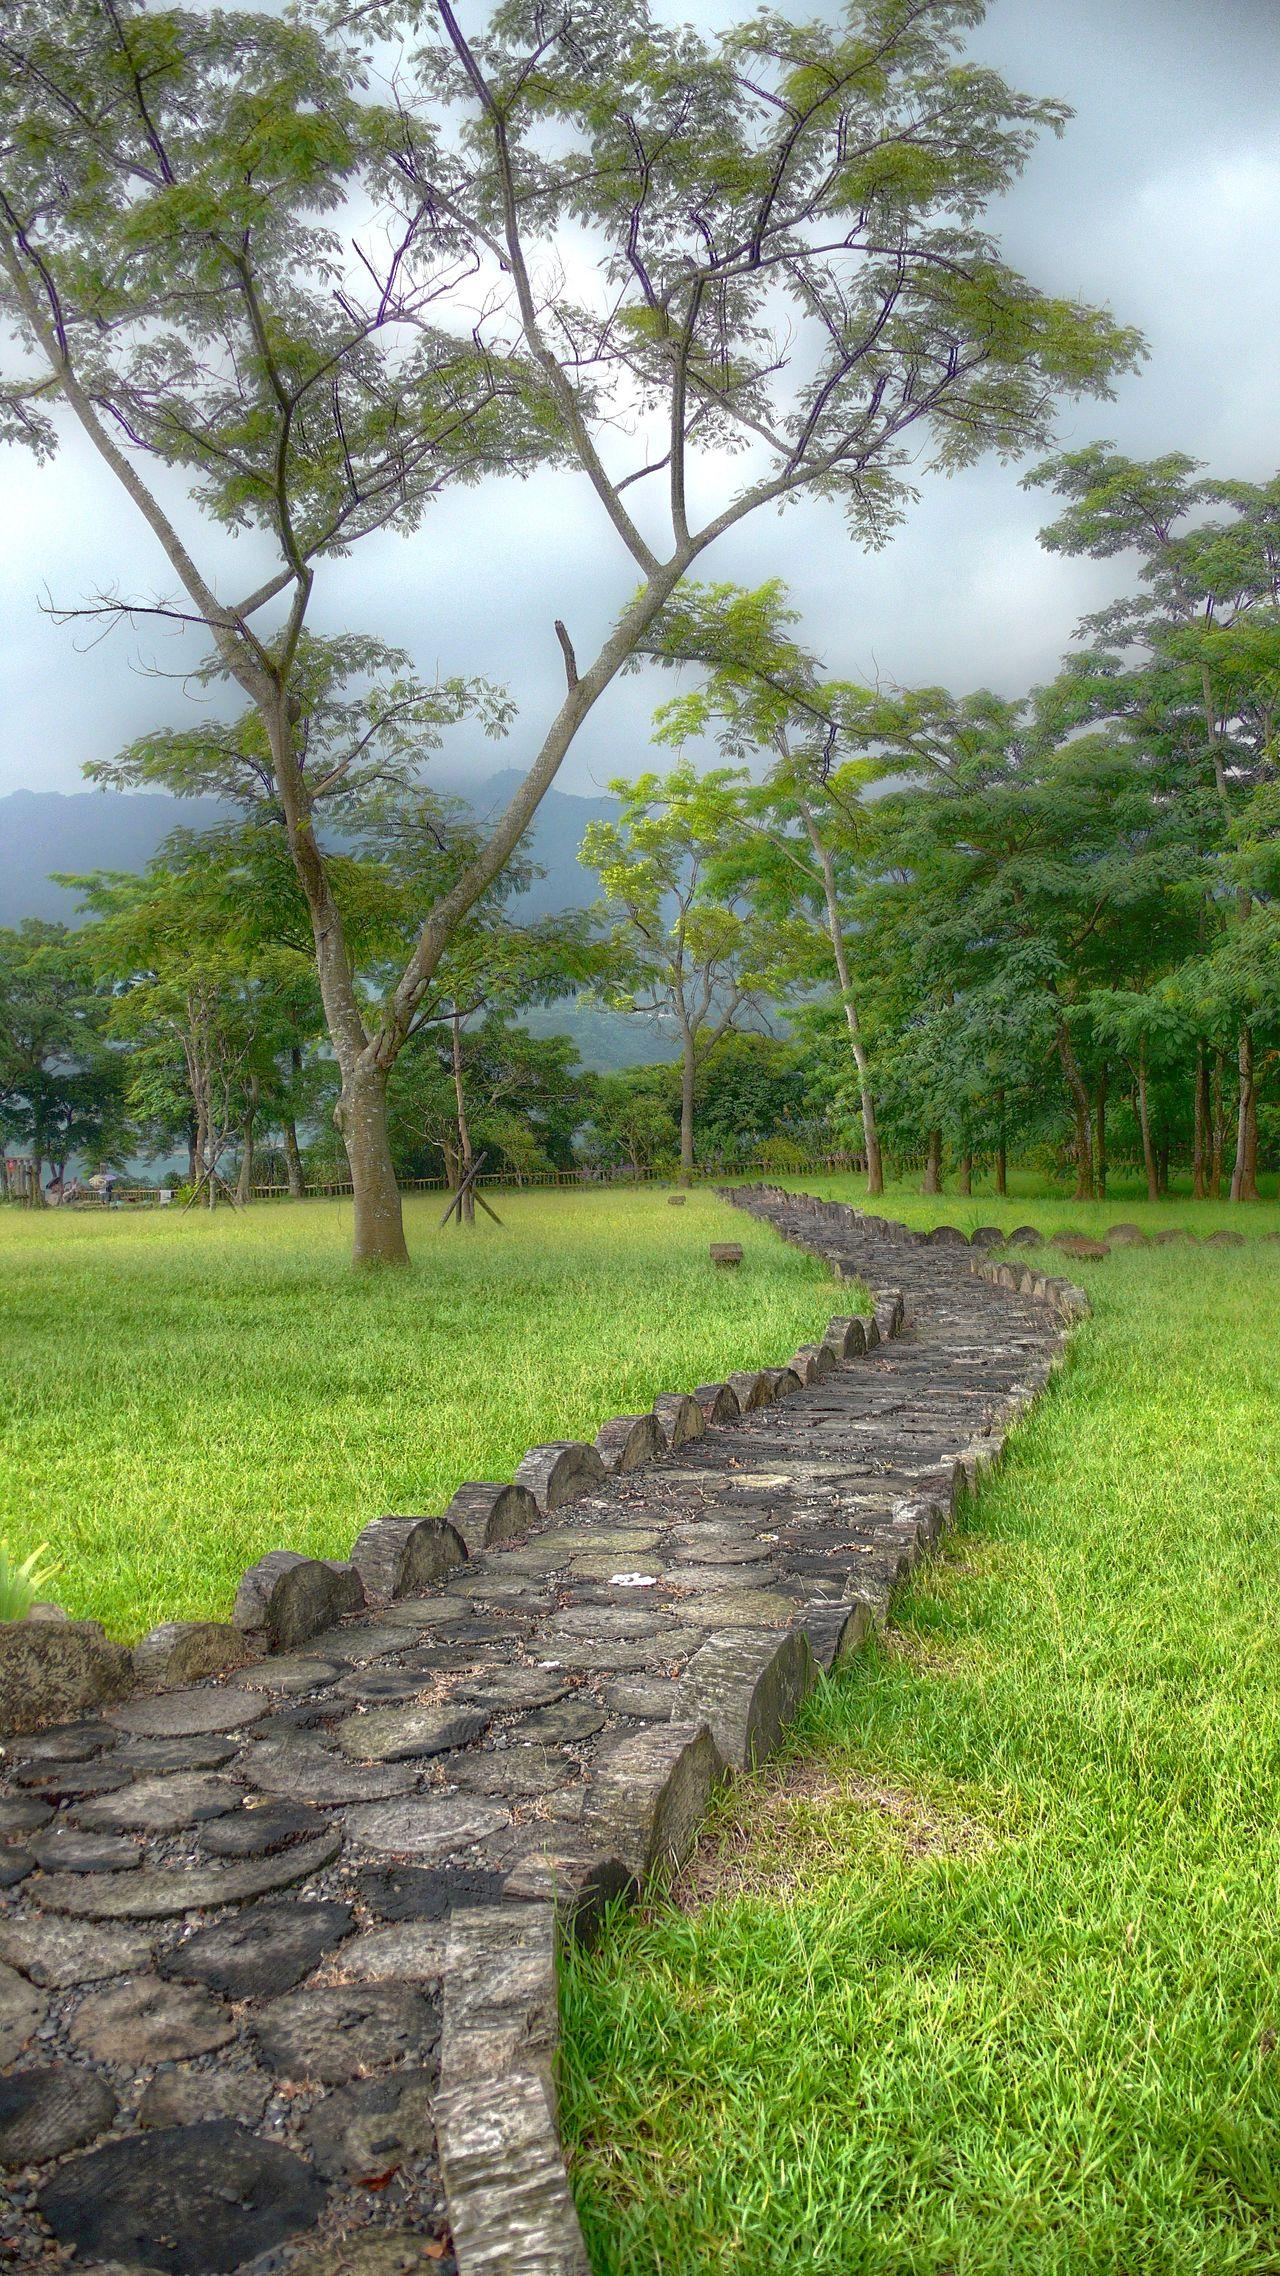 Flagstone Path Grass Grass And Trees Path Through The Trees Path, Grass, Tree Taiwan Wandering Path